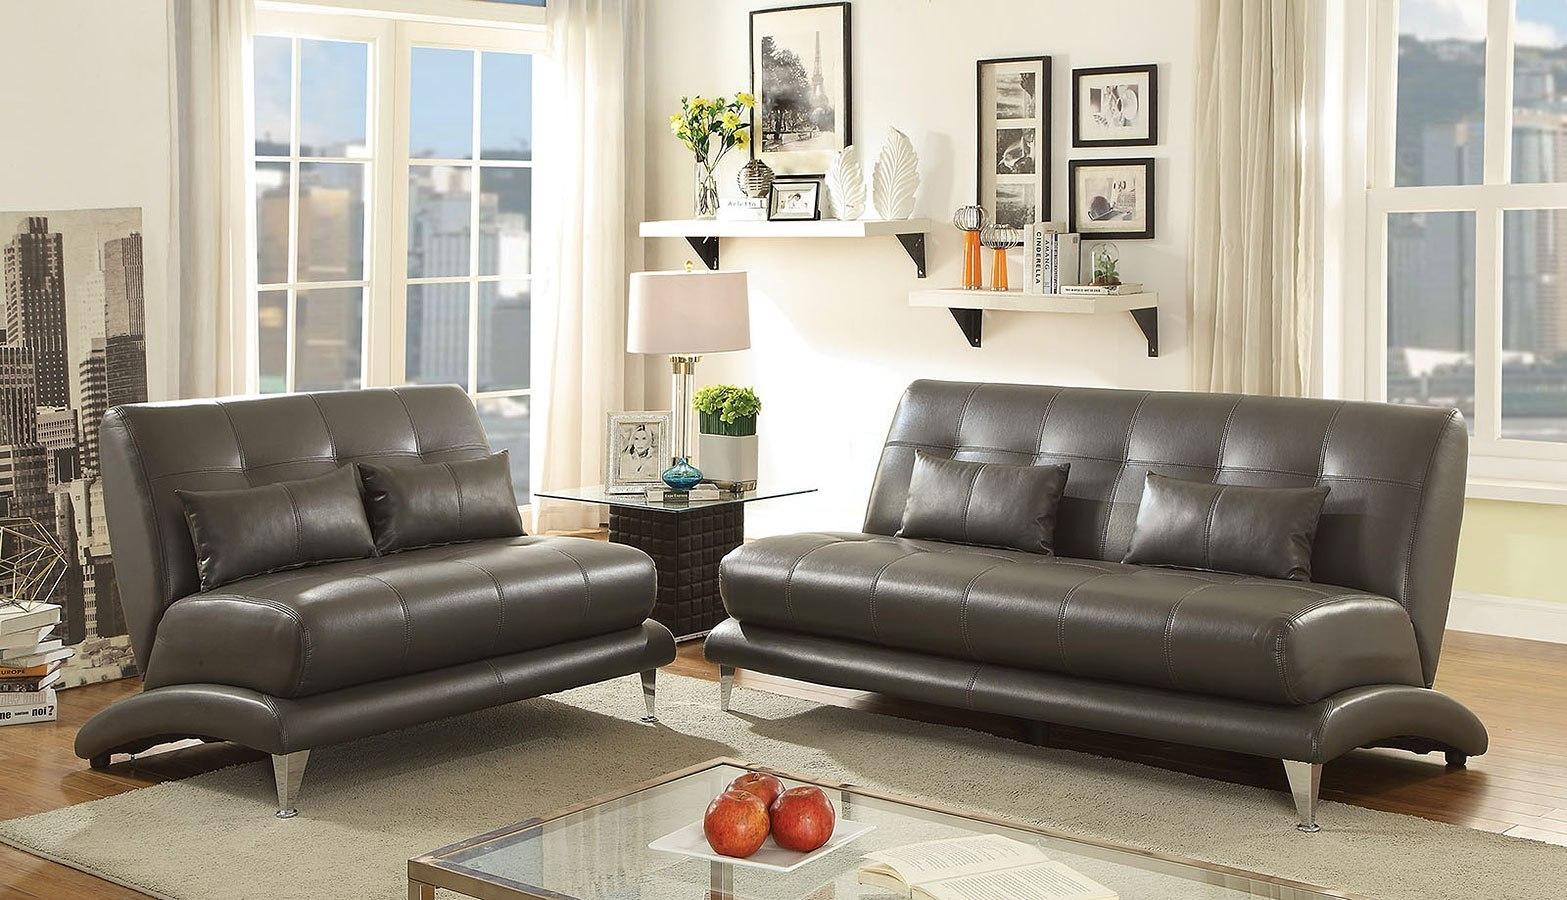 892 The Paradigm Living Room Set Grey: Sherri Living Room Set (Gray) By Furniture Of America